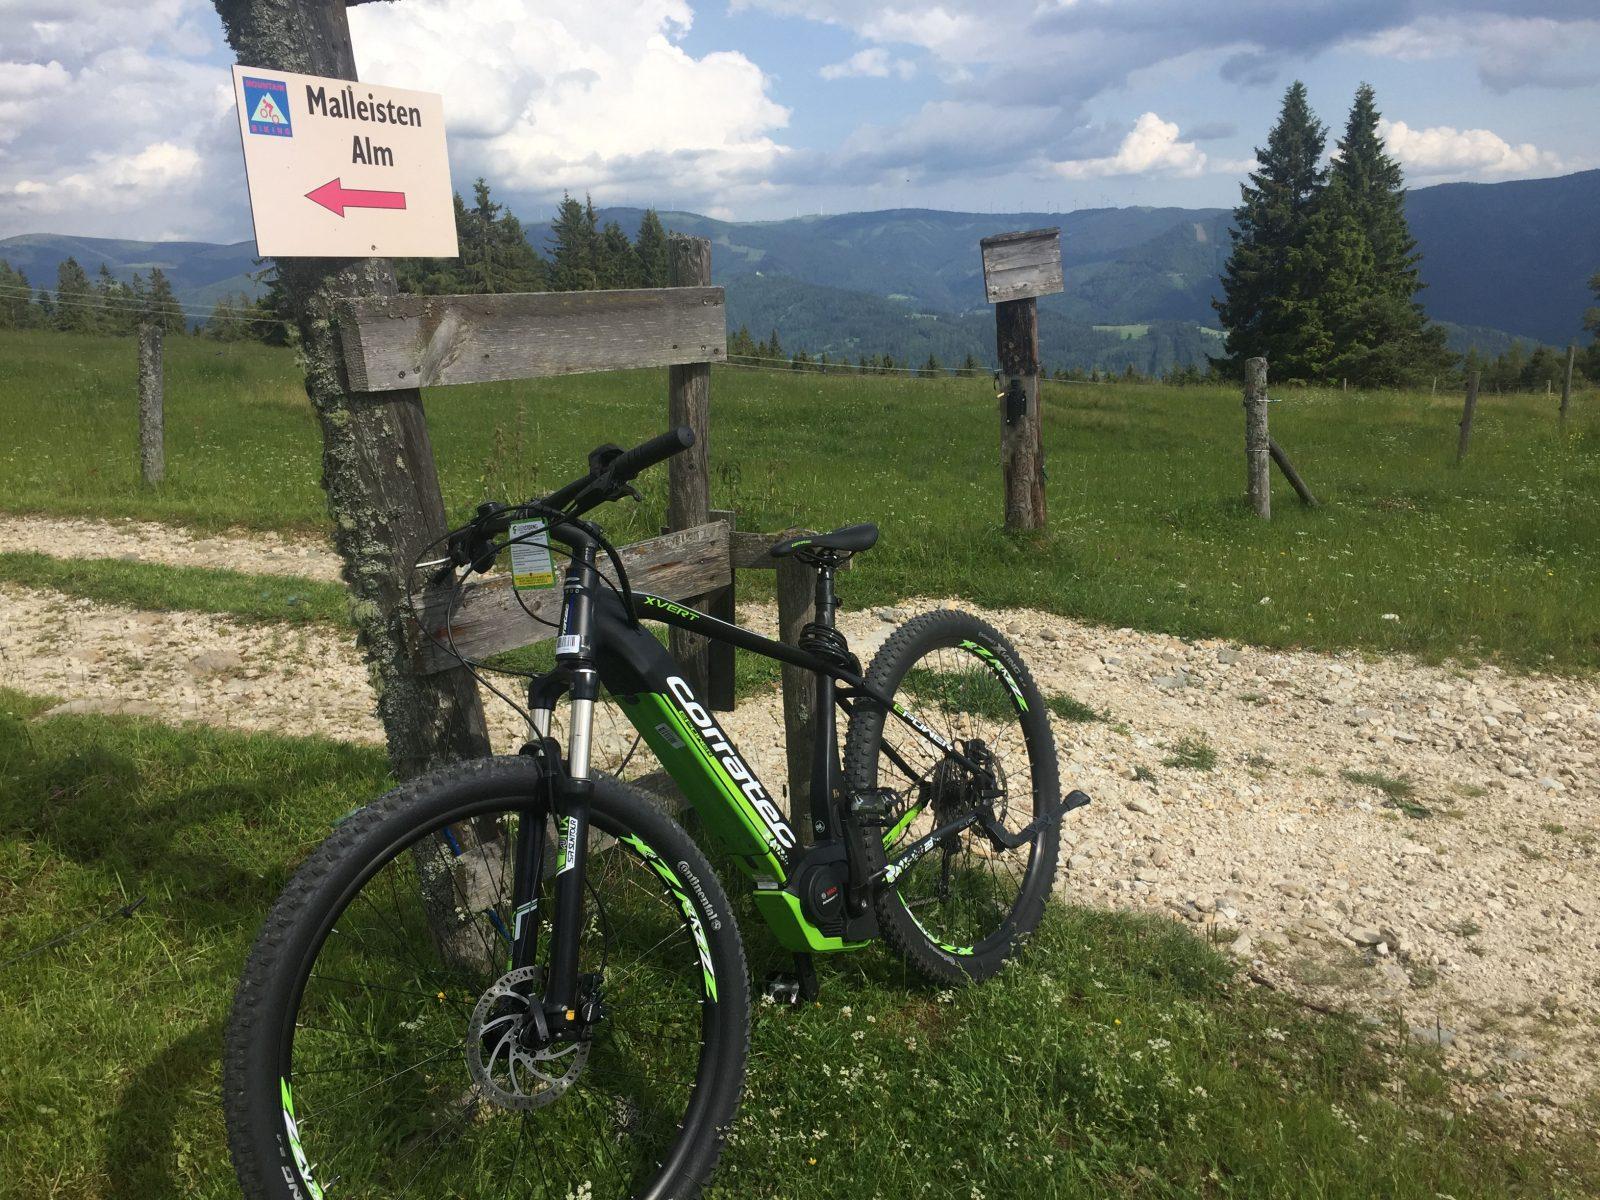 E-Mountainbike auf der Hönigsberg Alm, E-Bike